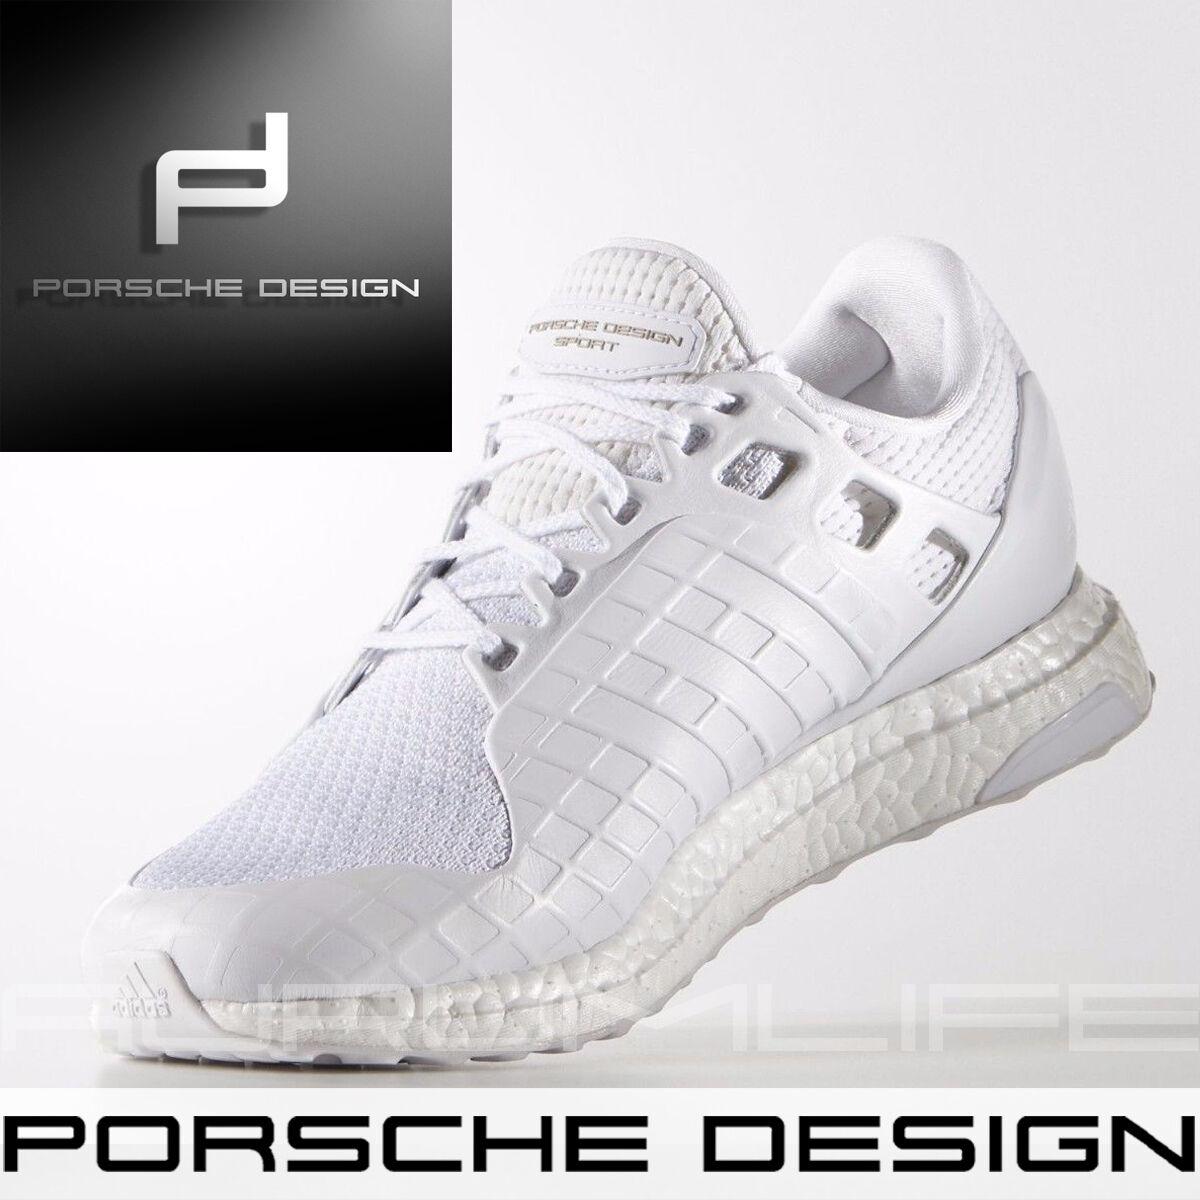 Adidas Porsche Design Ultra Boost Bounce férfi fehér cipő MÉRET 9 11.5 BB0682